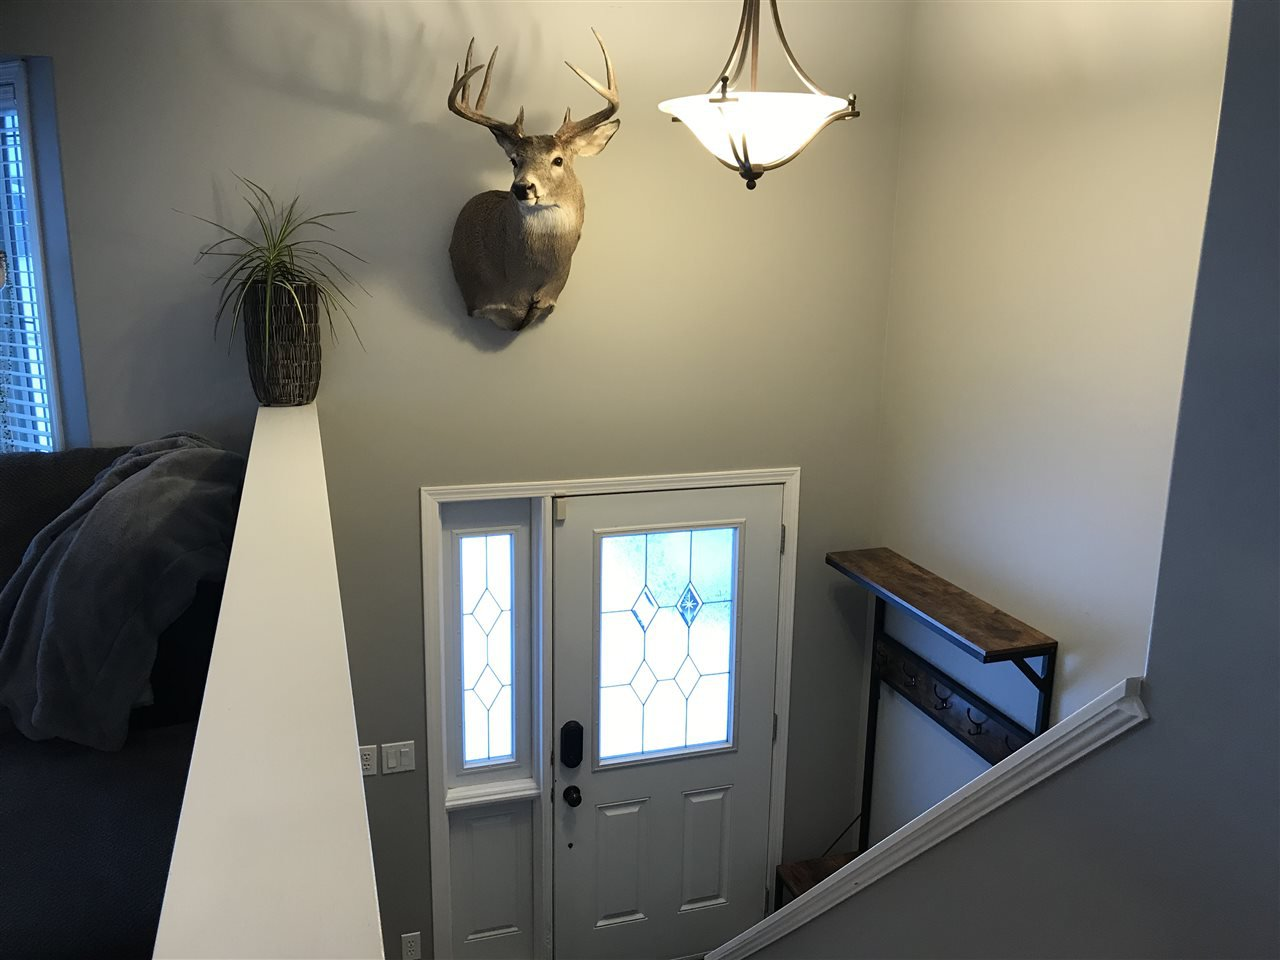 "Photo 8: Photos: 8724 114 Avenue in Fort St. John: Fort St. John - City NE House for sale in ""PANORAMA RIDGE"" (Fort St. John (Zone 60))  : MLS®# R2428633"